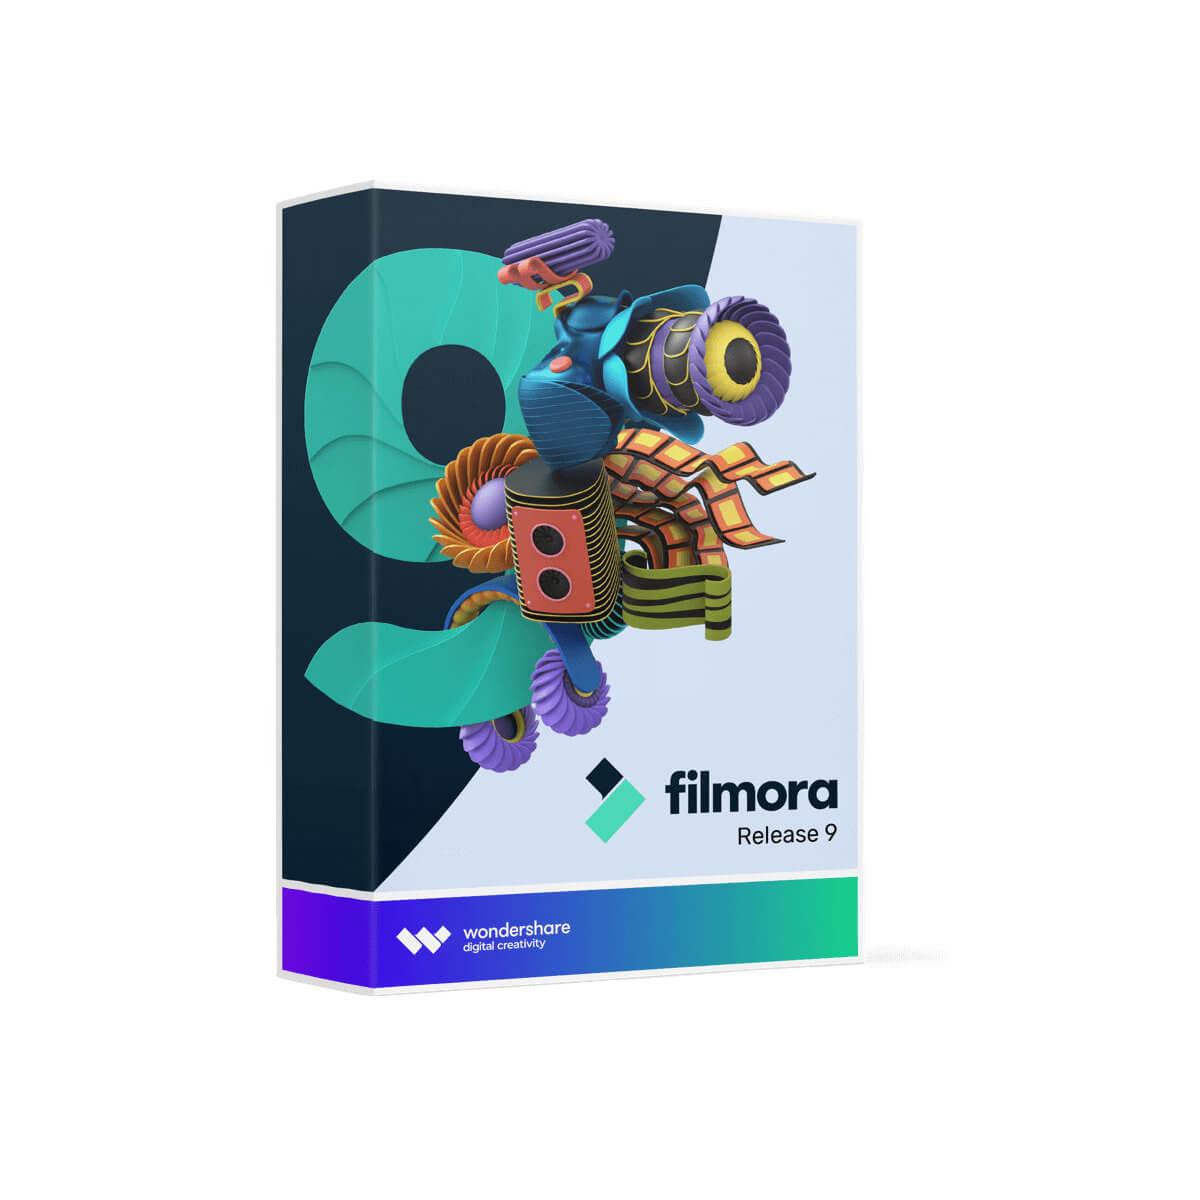 Wondershare Filmora 9.1.5.1